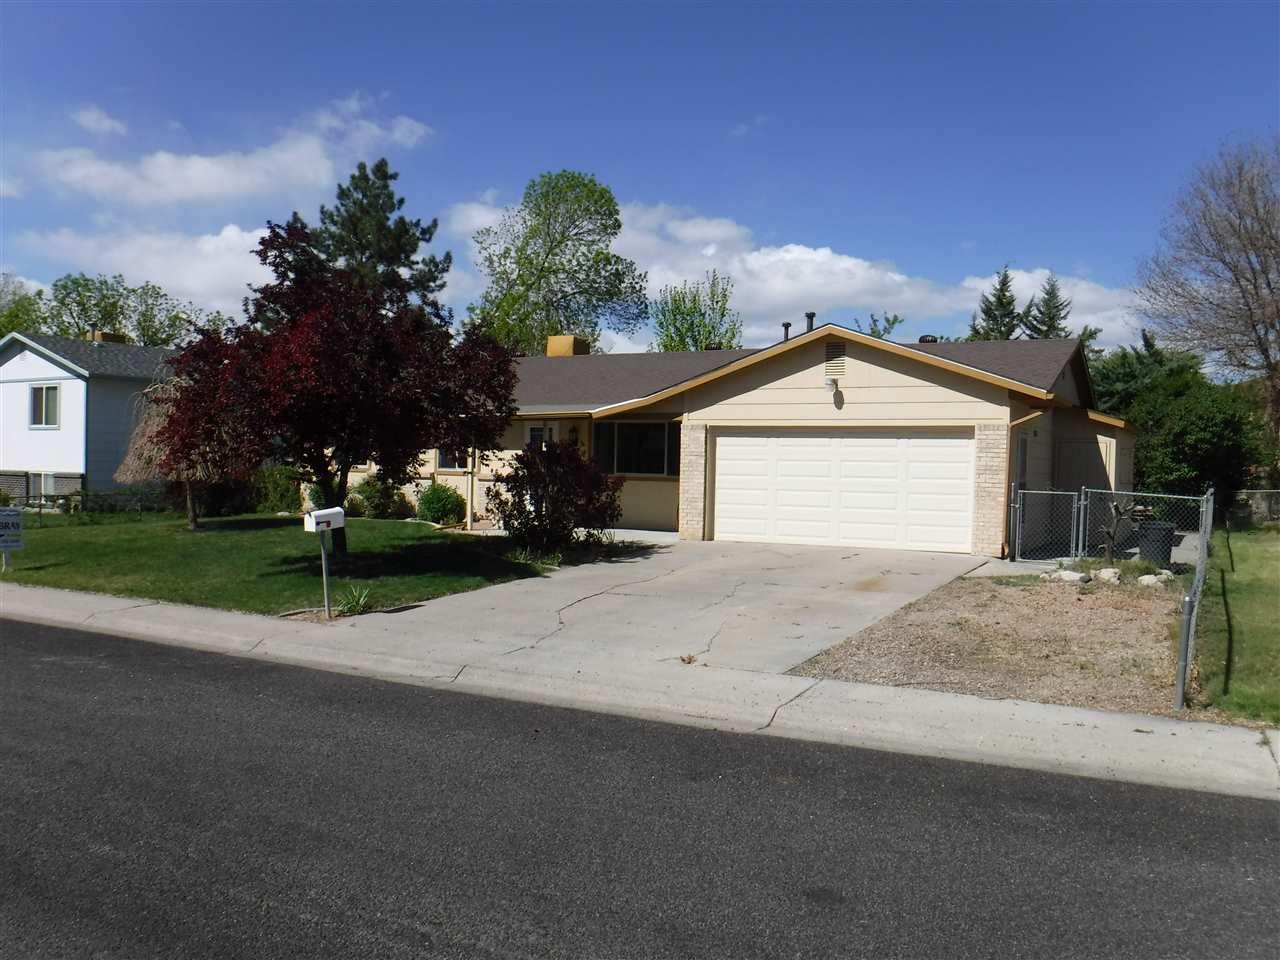 637 Karen Lee Drive, Grand Junction, CO 81504